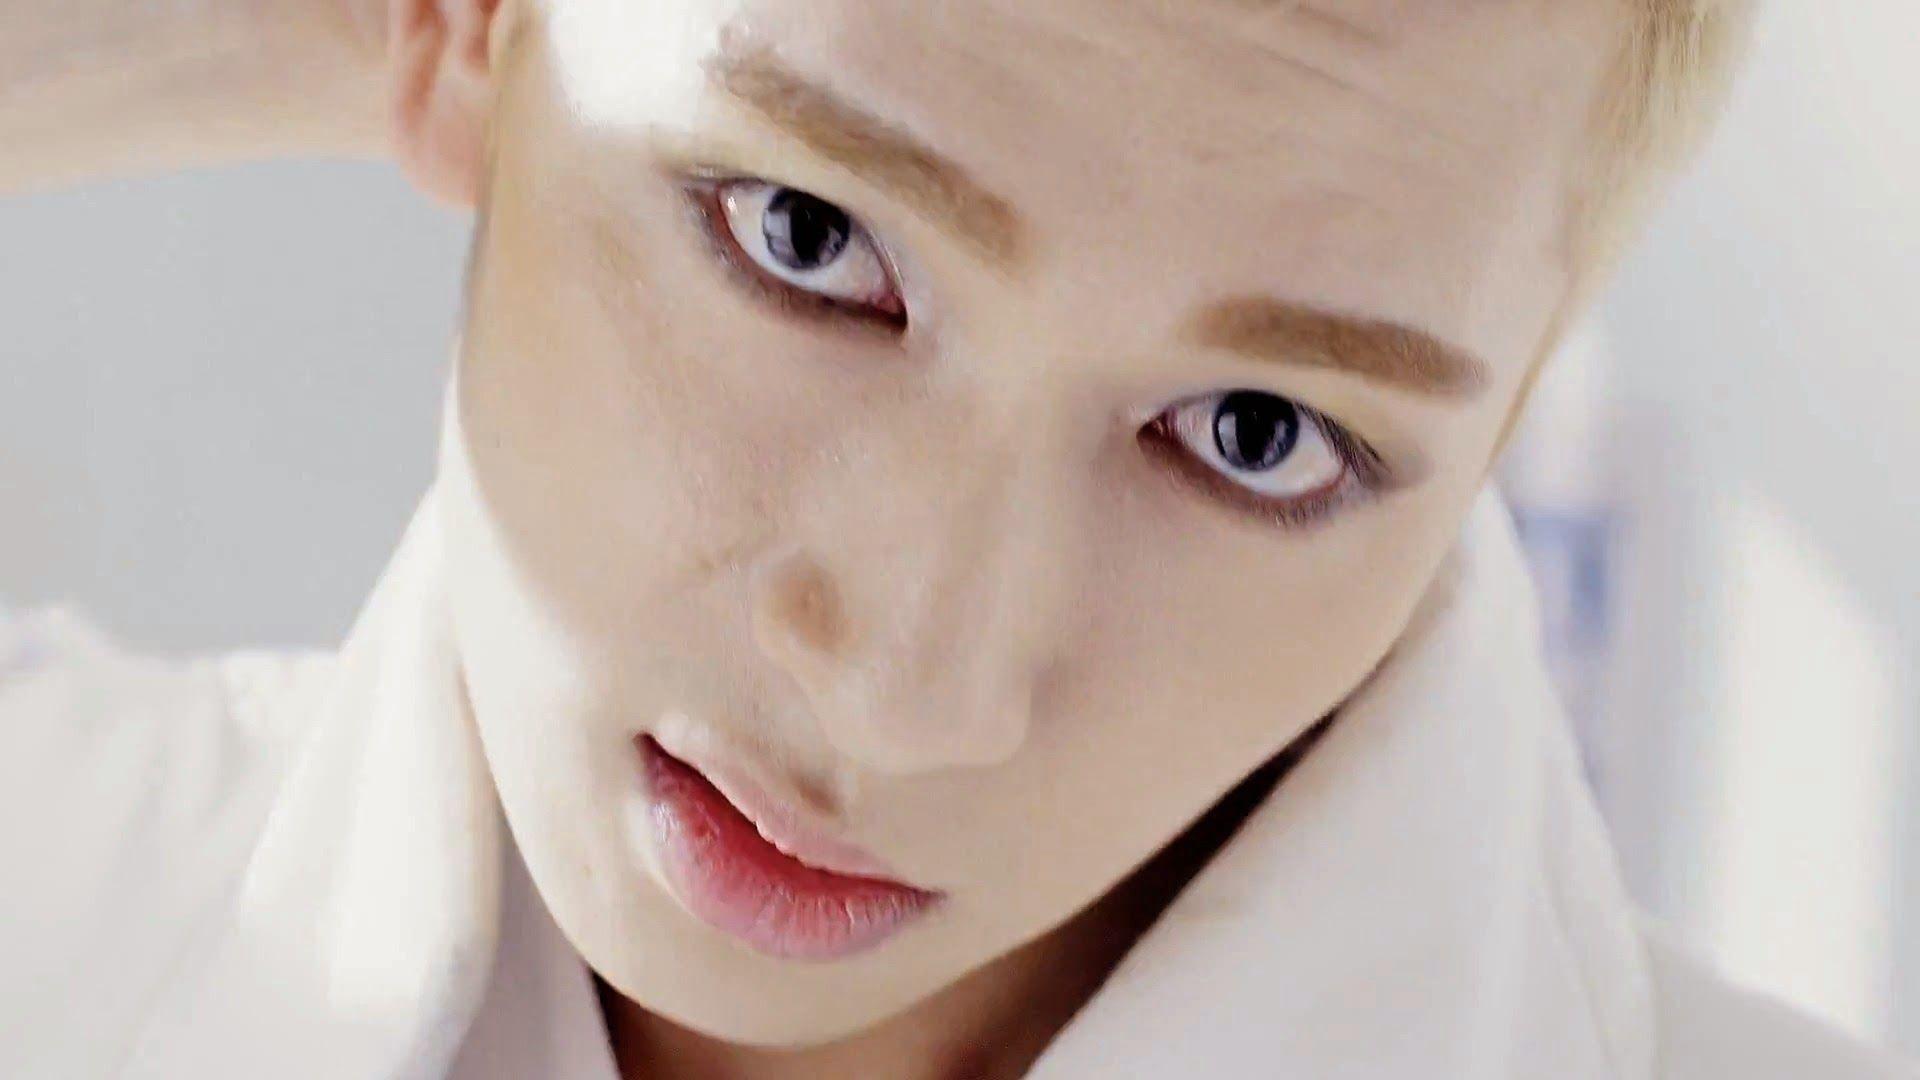 *heart eyes*  { #Seyoung #LeeSeyoung #MiracleGene #CrossGene #CandY #AmuseKorea }